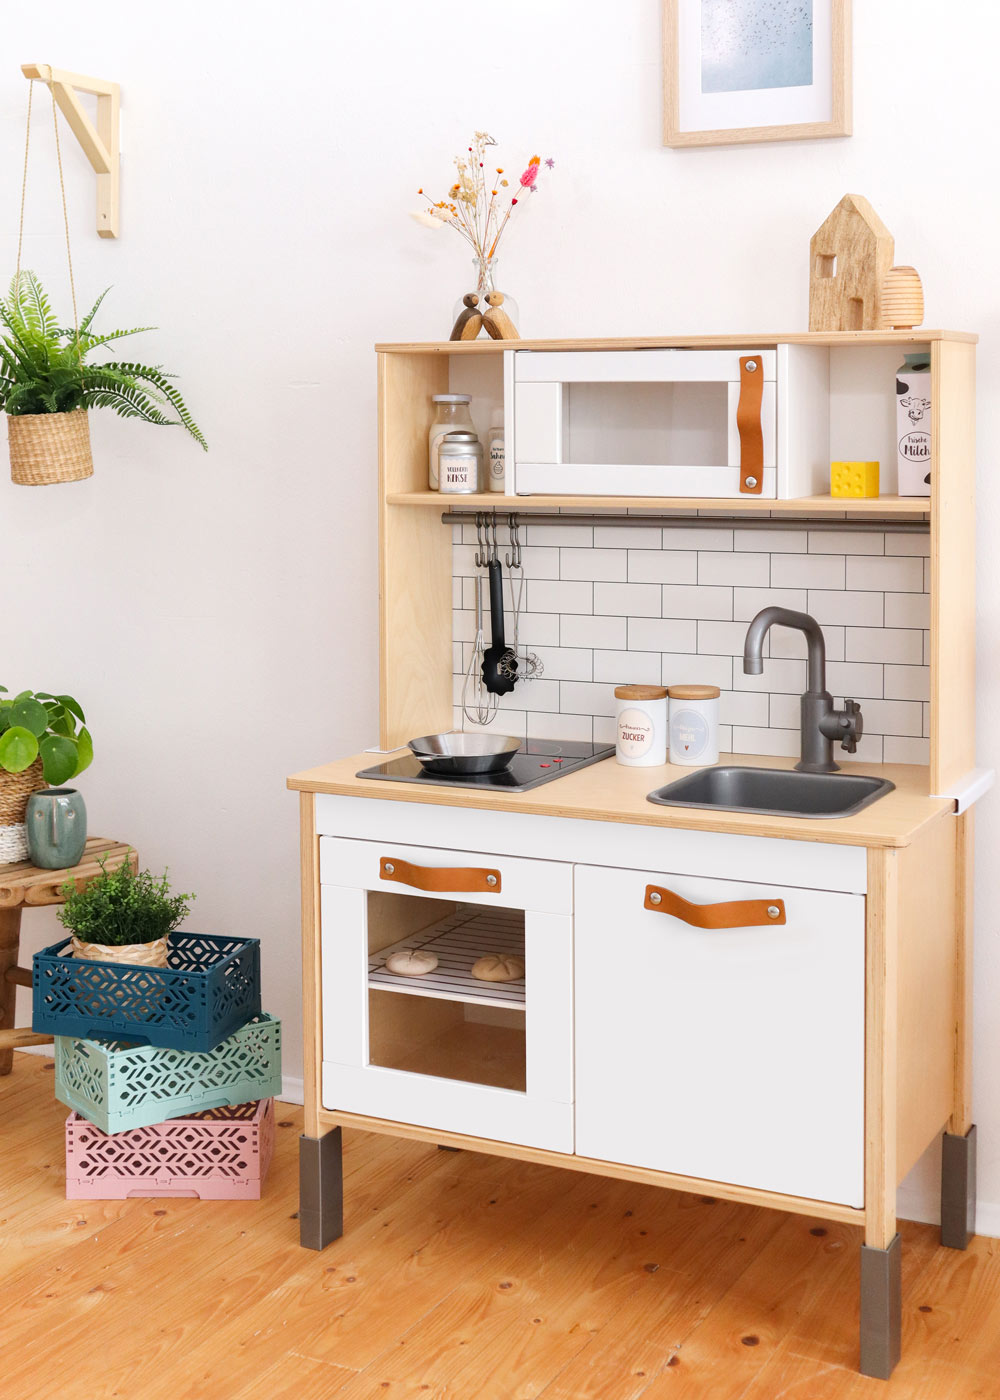 Ikea Duktig Kinderküche Kachla Metro weiss Komplettansicht